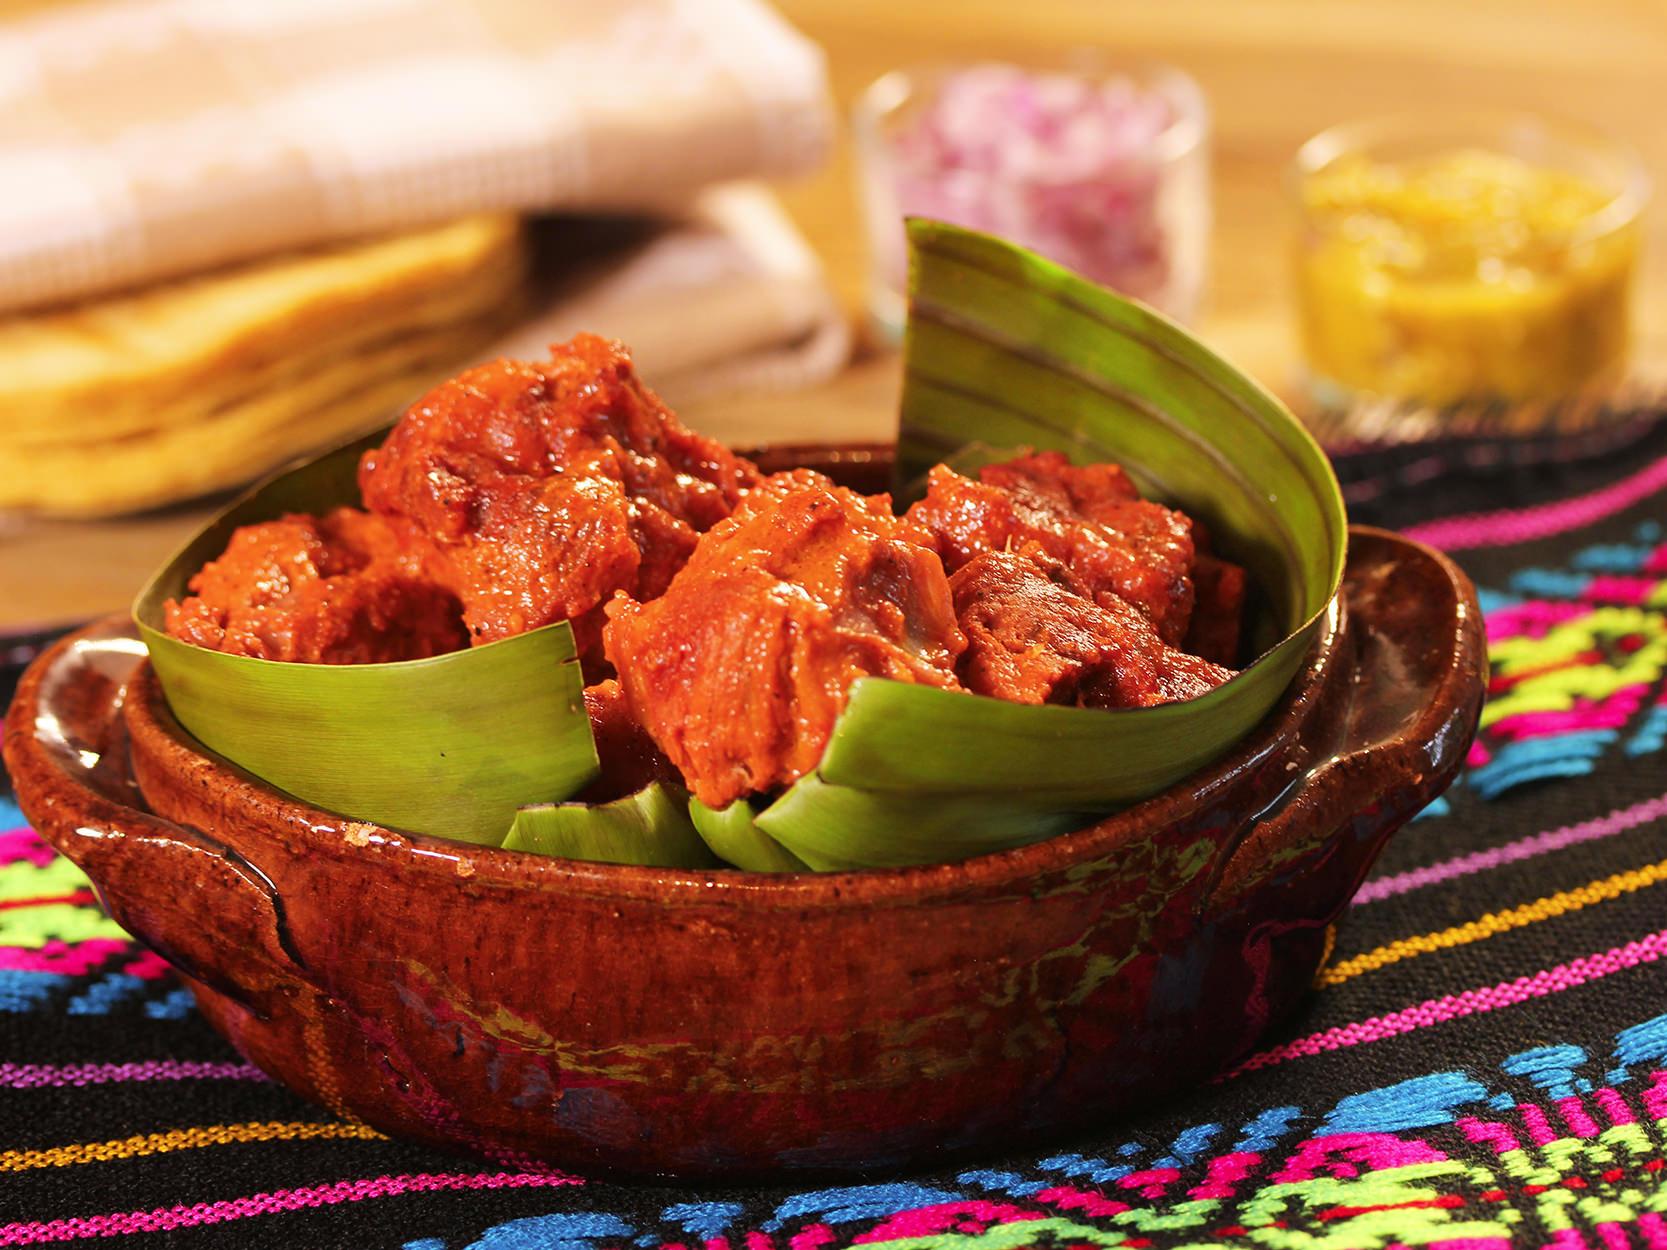 preparar cochinita pibil